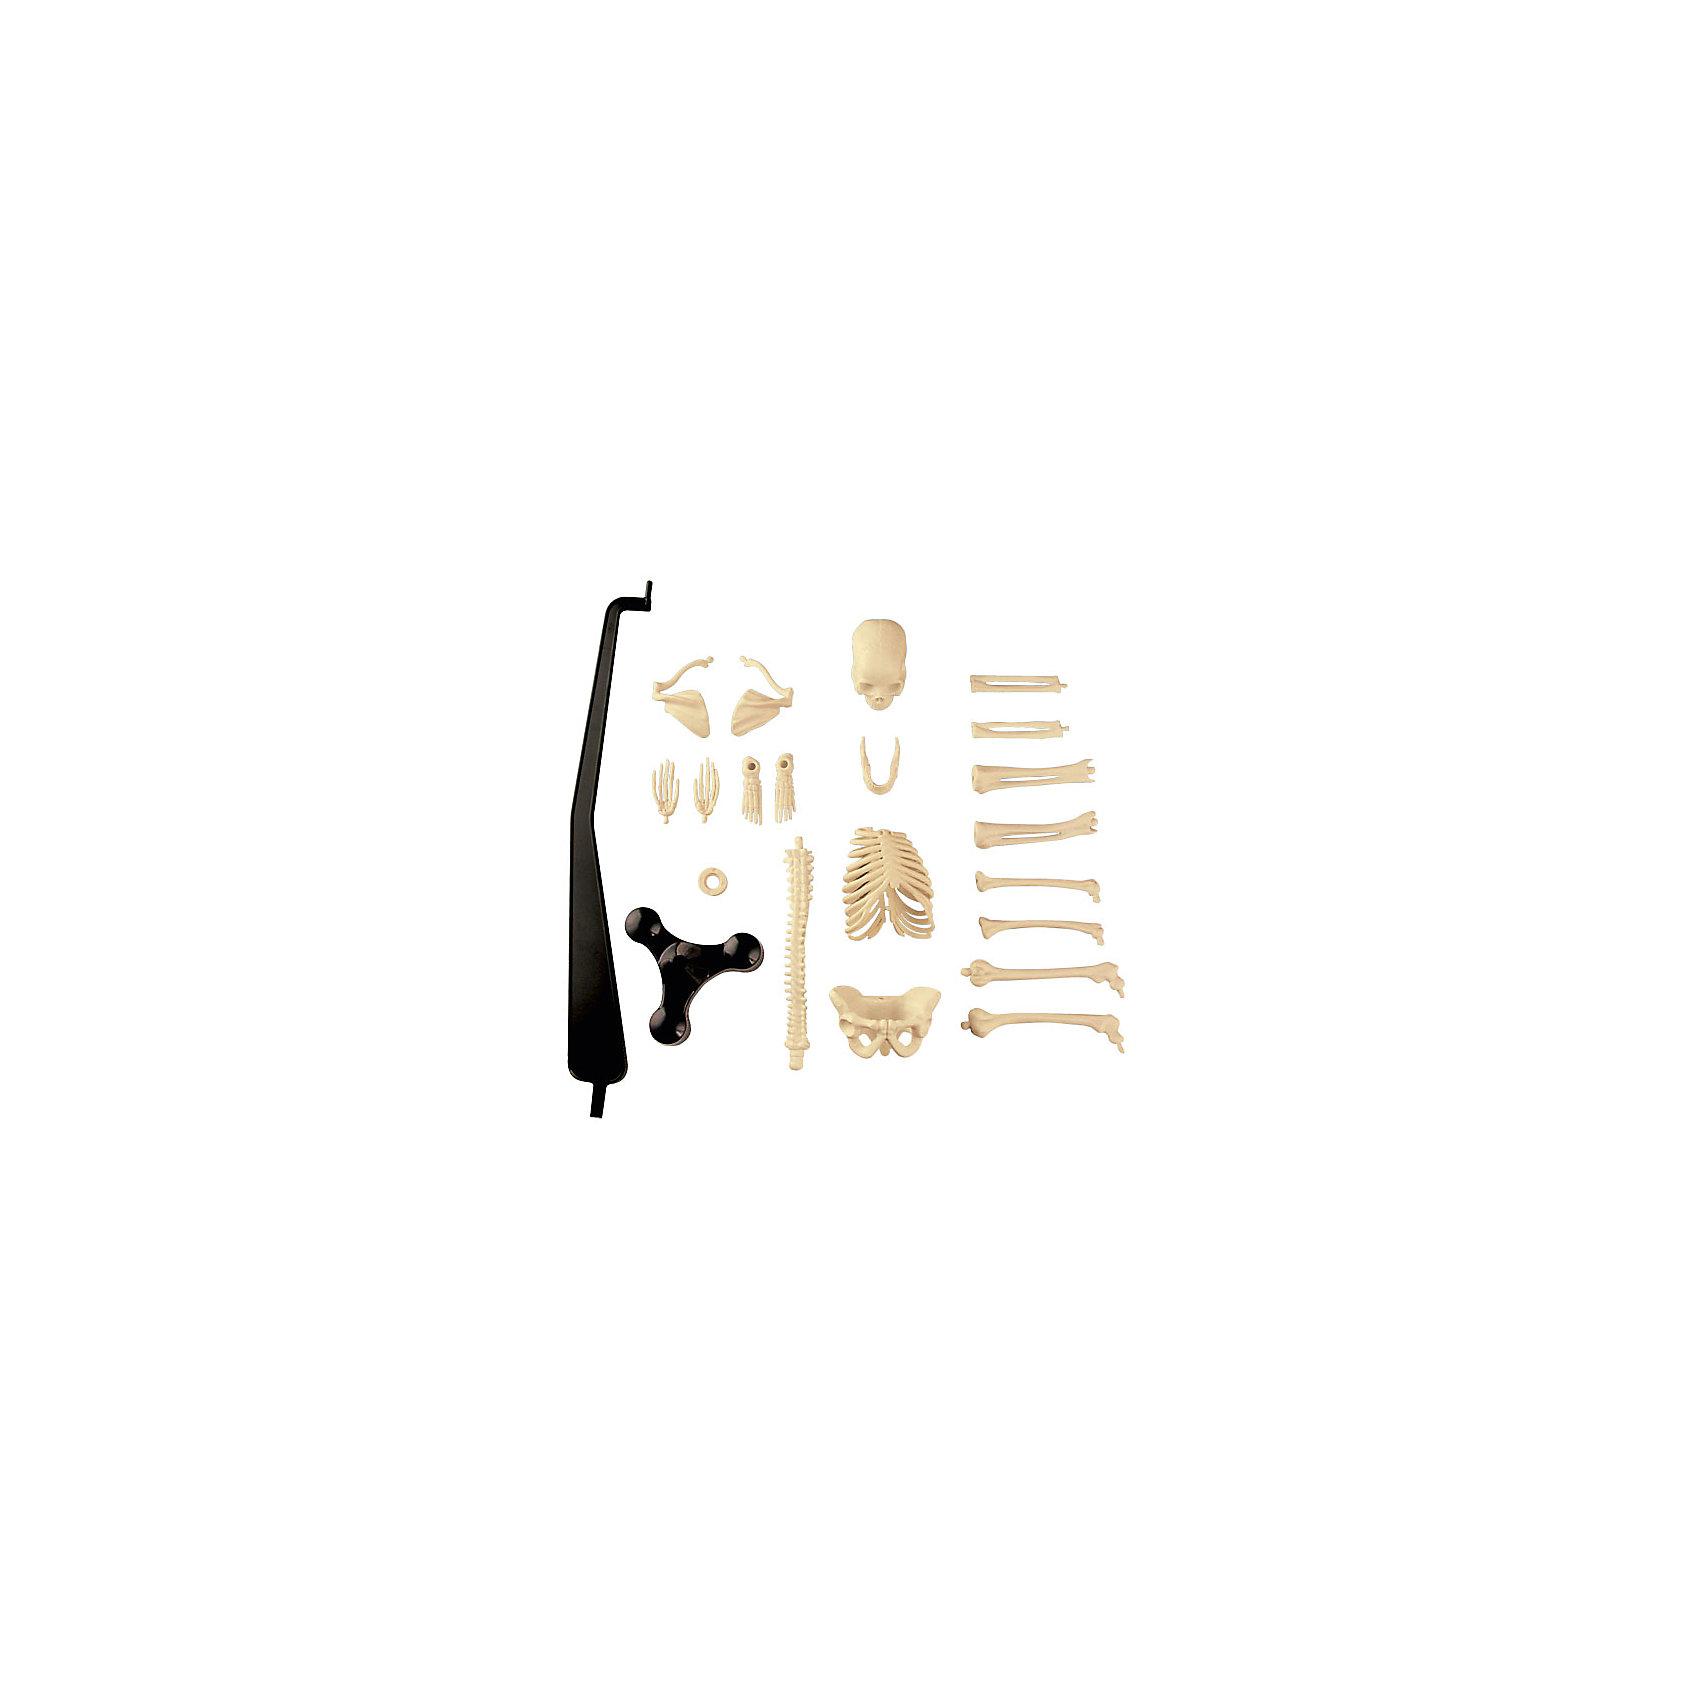 Сборная модель скелета, Edu-Toys от myToys